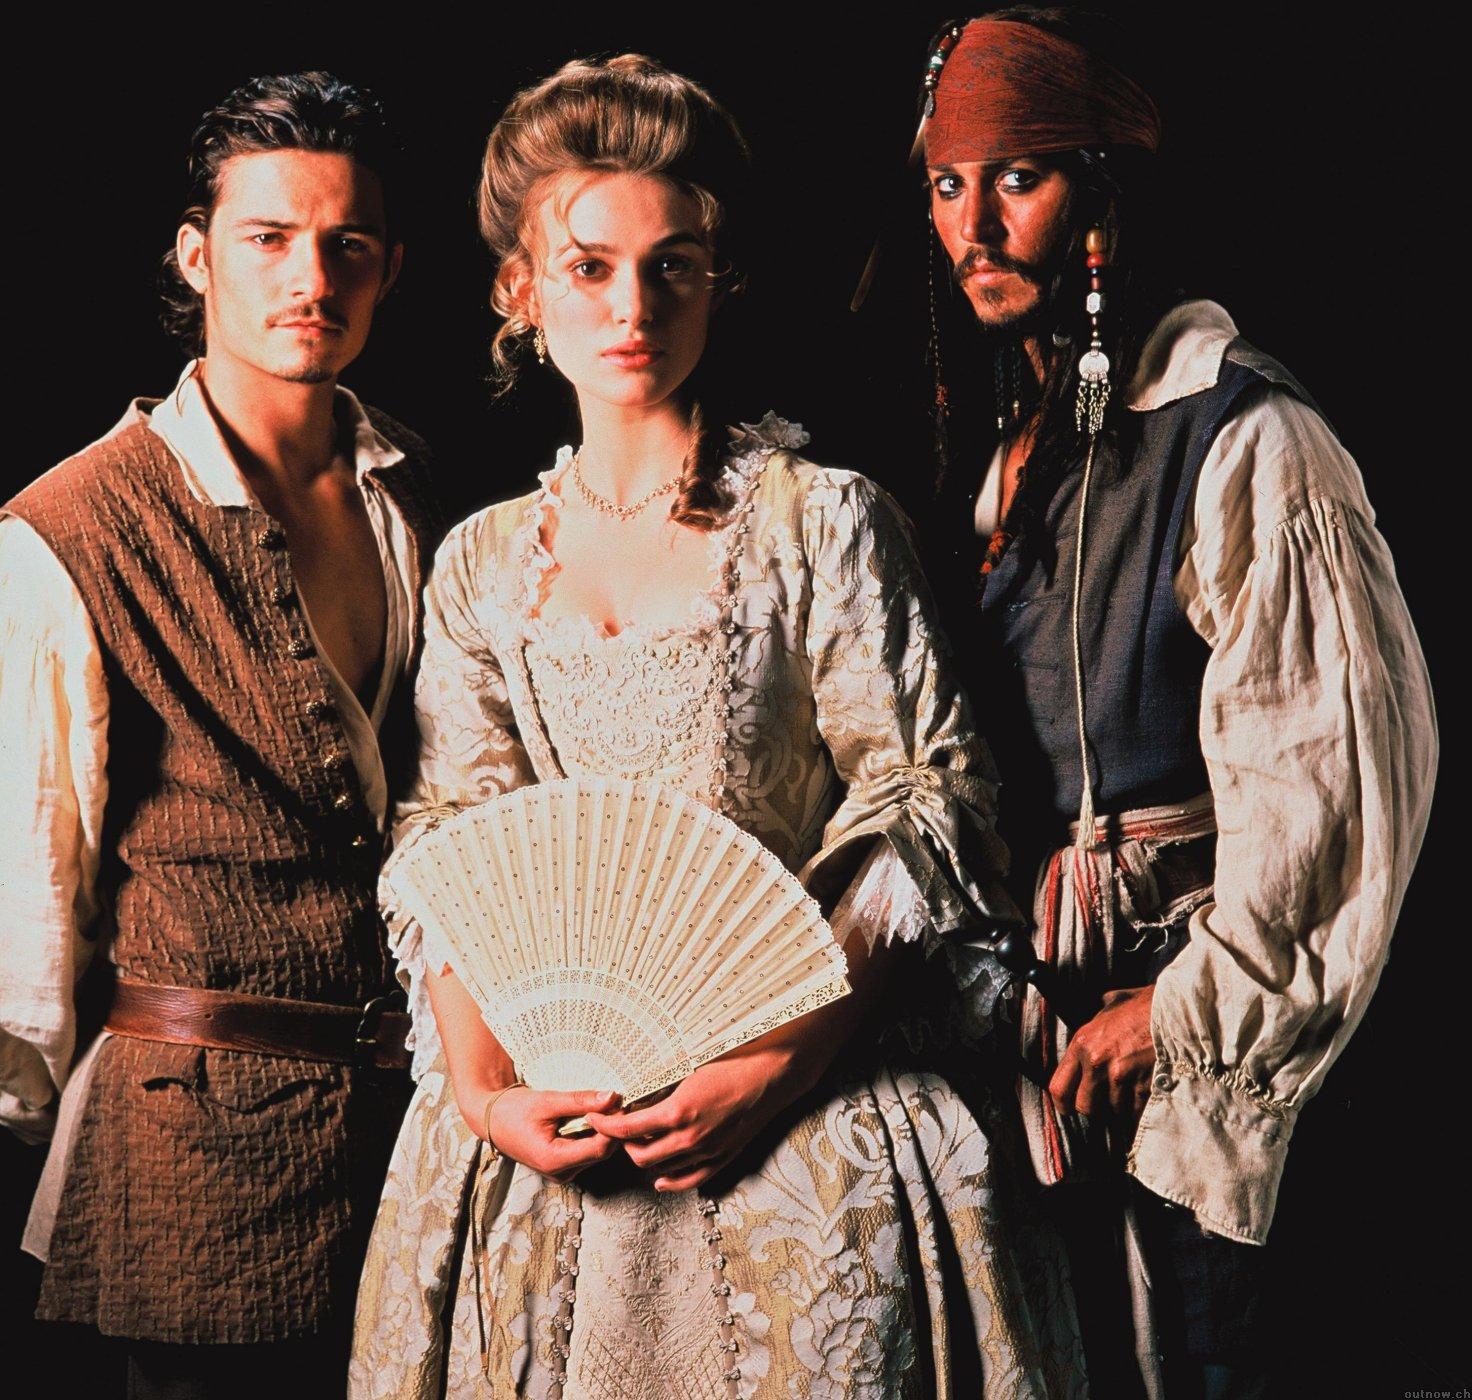 Orlando Bloom, Kiera Knightley, Johnny Depp